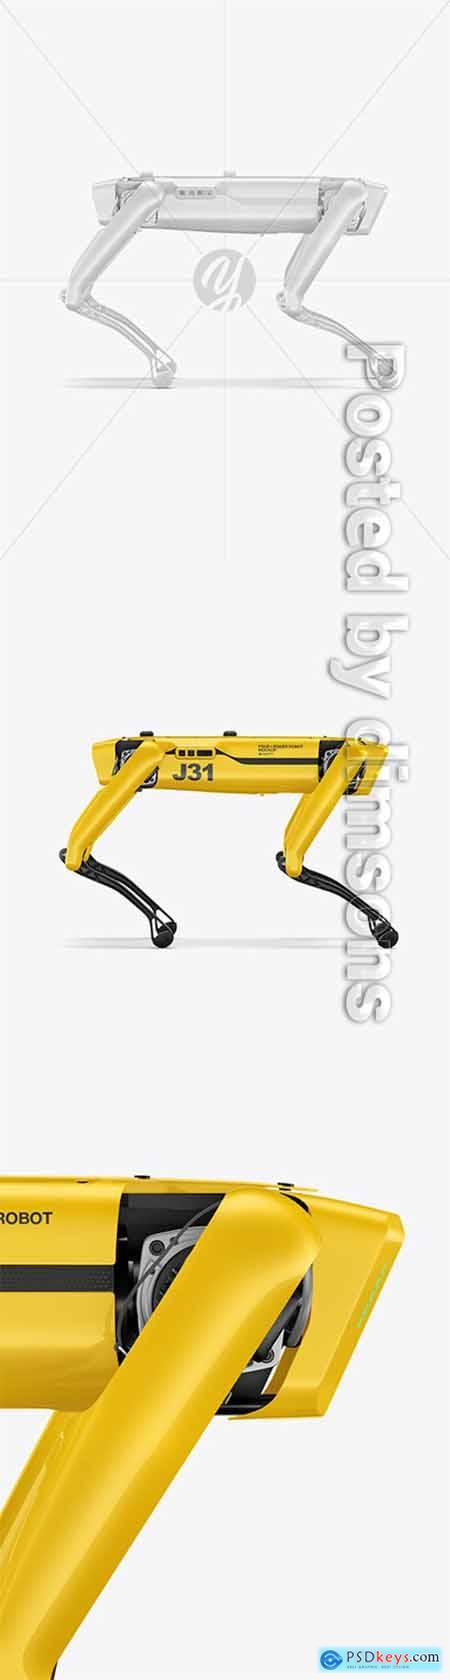 Four-Legged Robot Mockup 66074